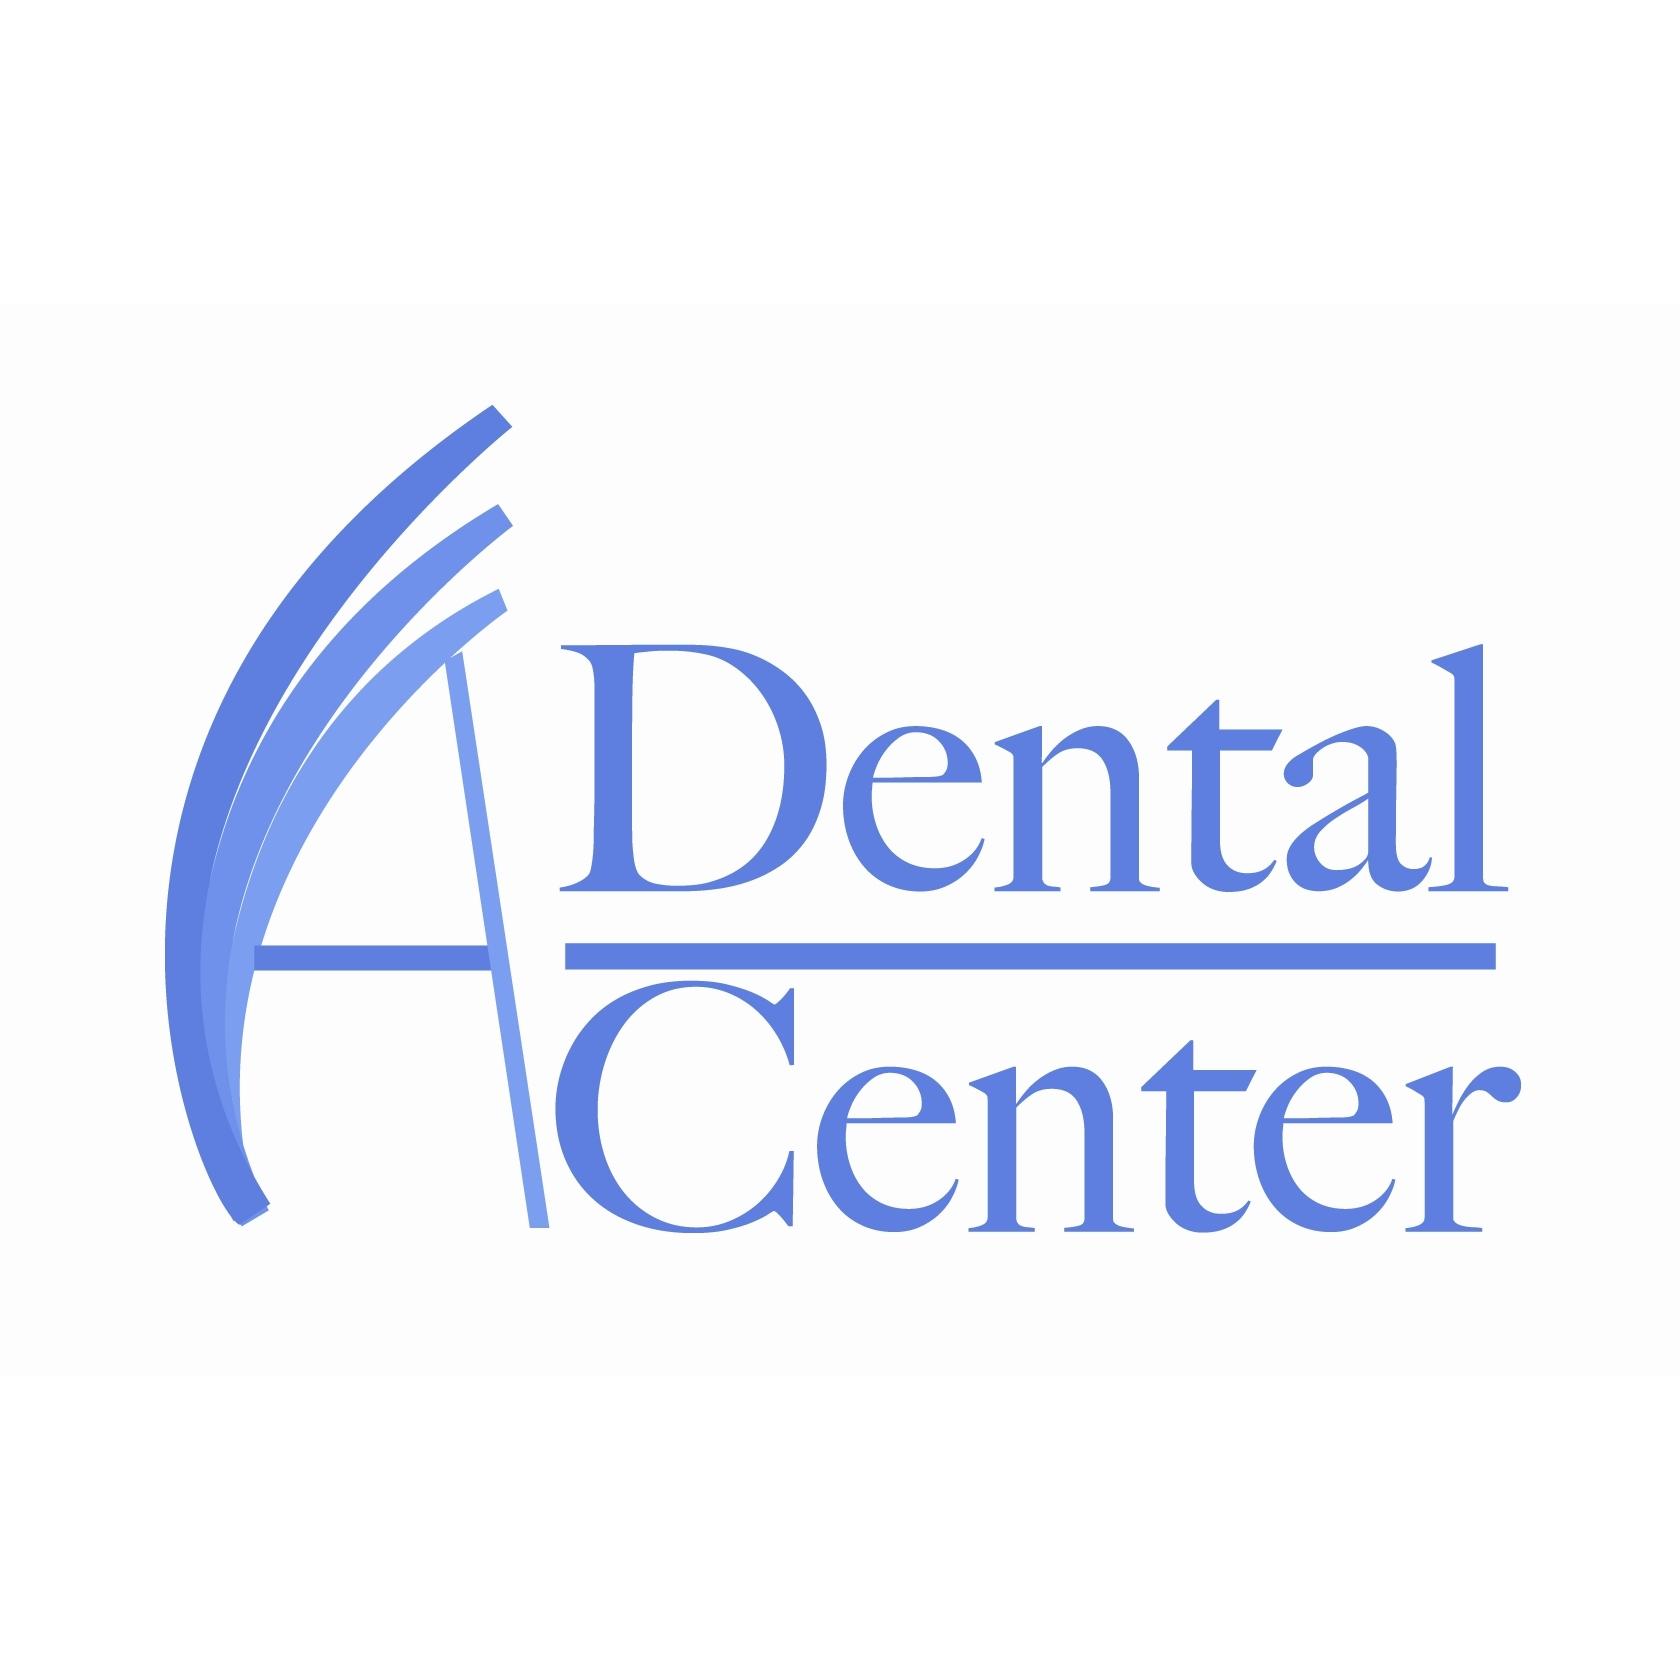 A-Dental Center Logo